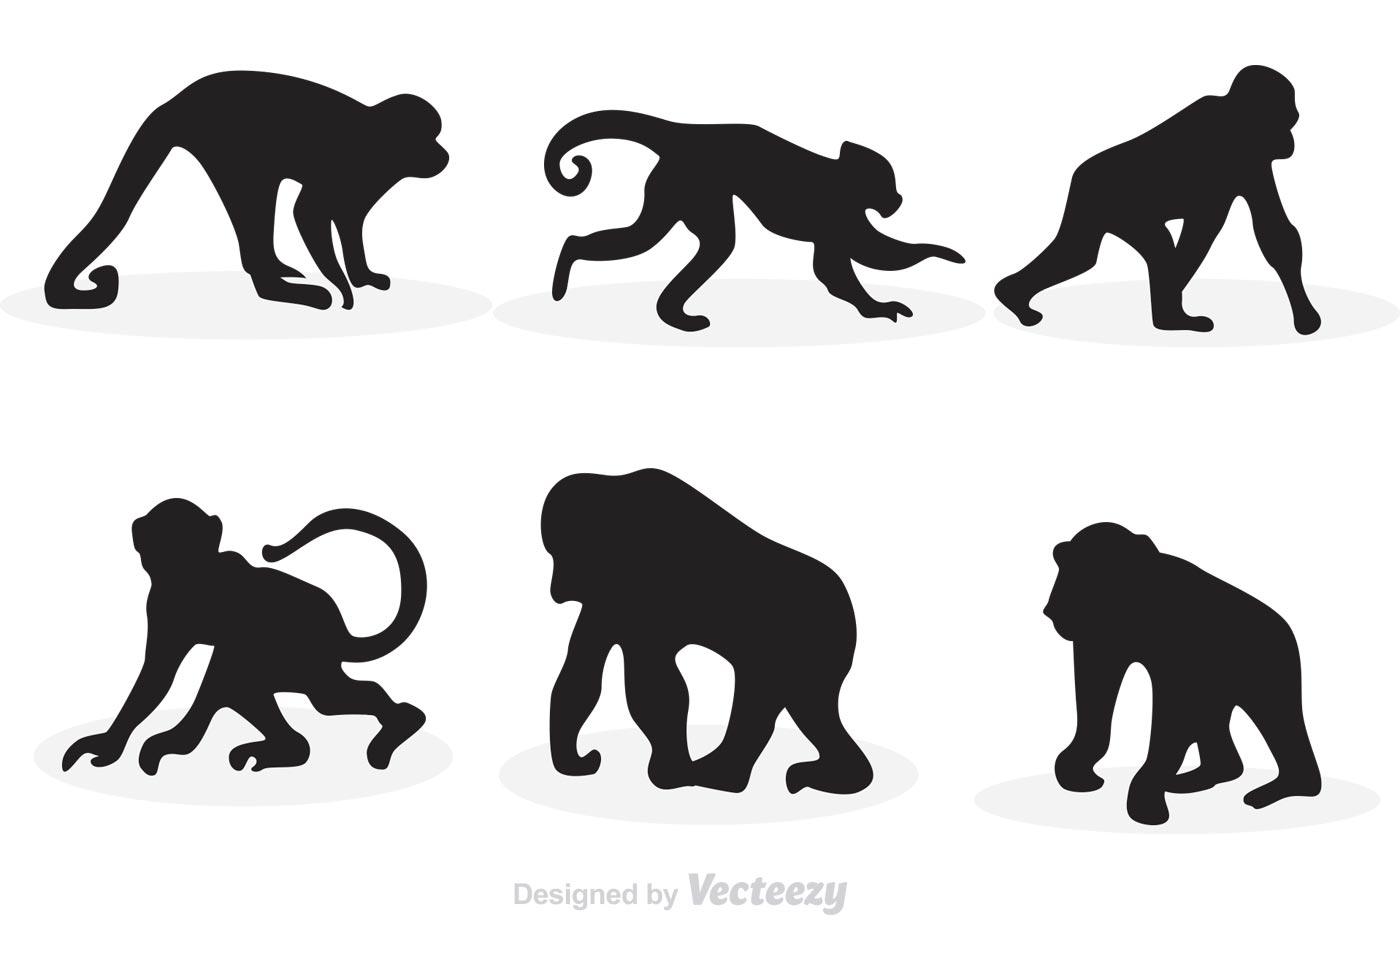 Monkey Silhouette Vectors